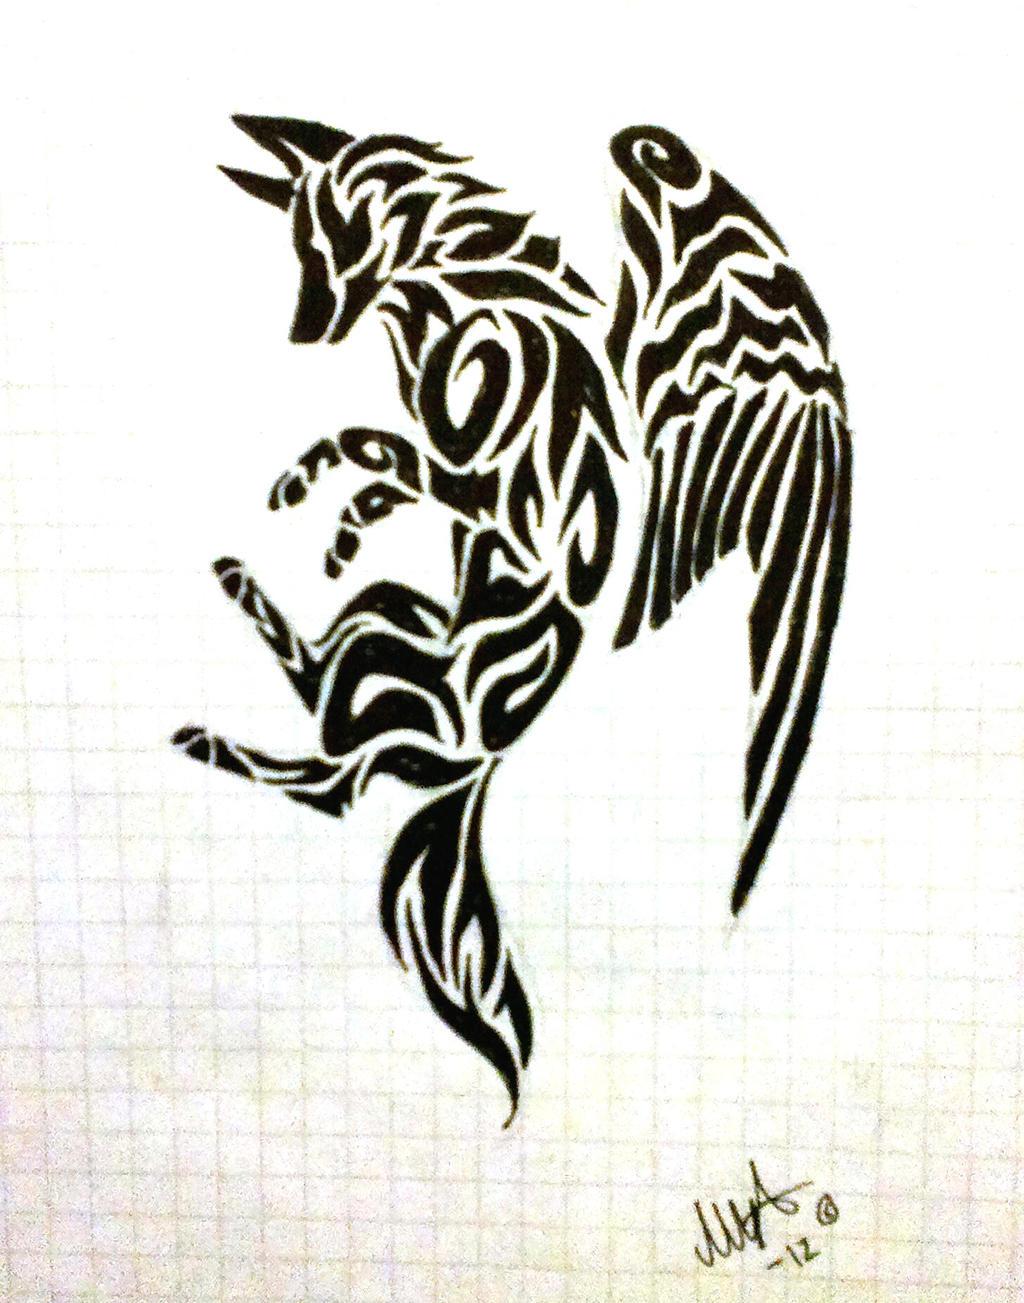 Angel wolf tattoo by MineaAmanda on DeviantArt